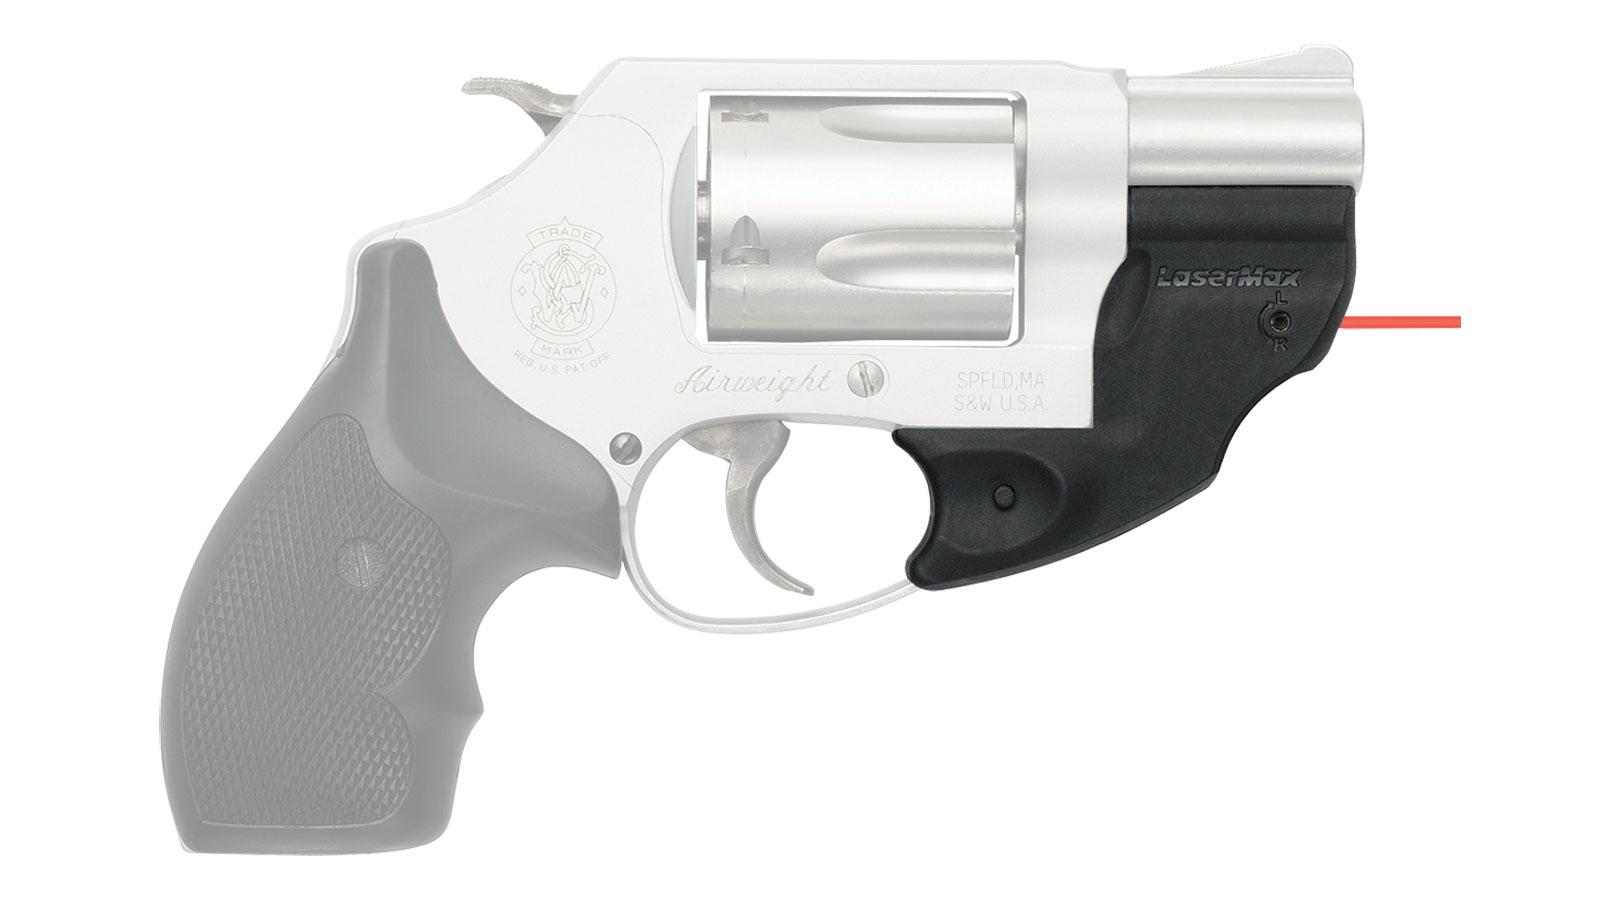 LaserMax CenterFire Smith Wesson J-Frame V2 Black